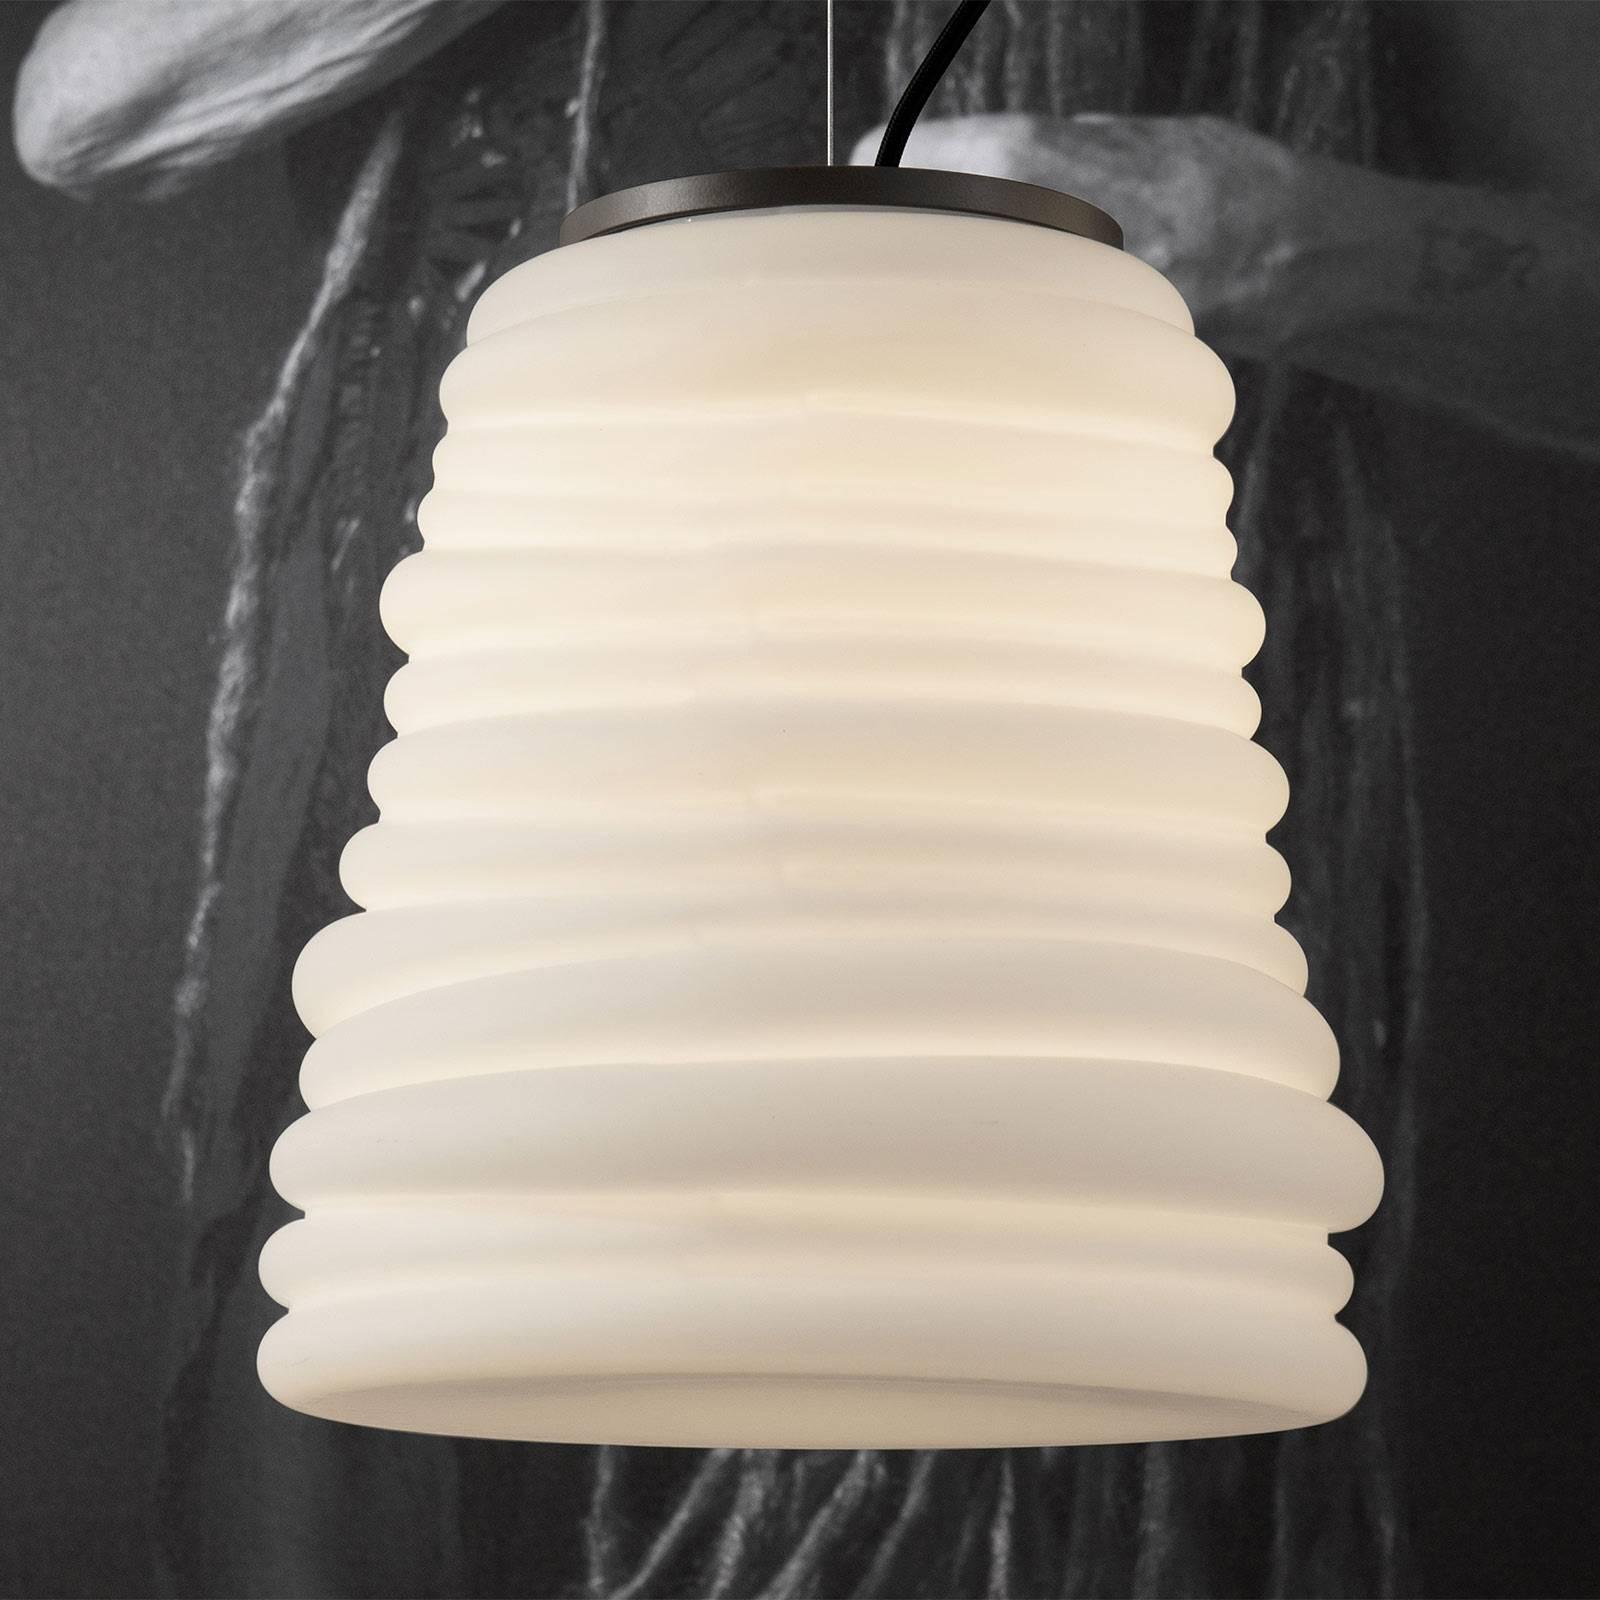 Karman Bibendum lampa wisząca LED, Ø 30 cm, biała